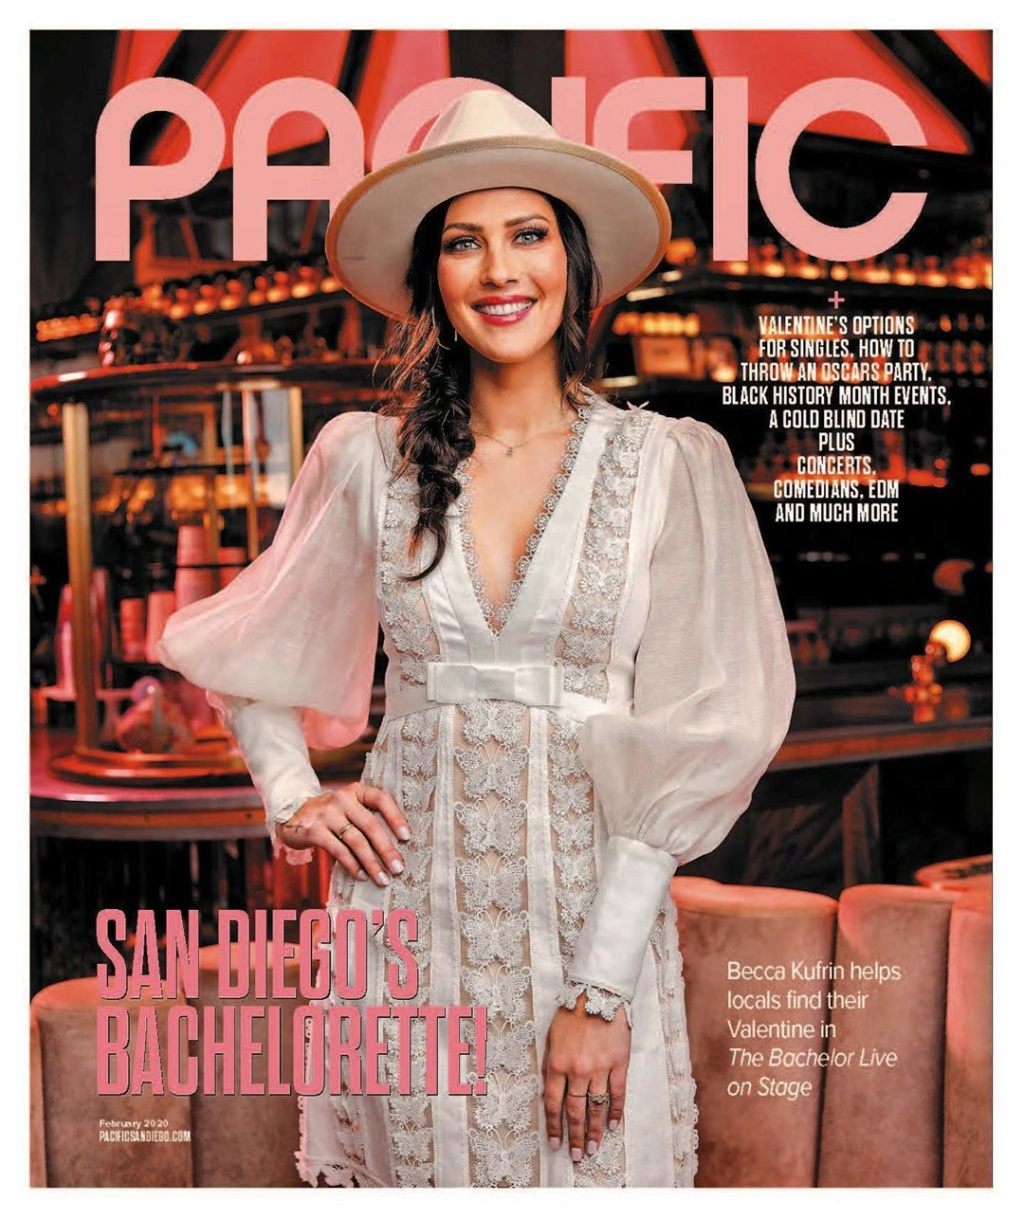 Bachelorette 14 - Becca Kufrin - Garrett Yrigoyen - FAN Forum - #4 - Page 54 Pacifi10